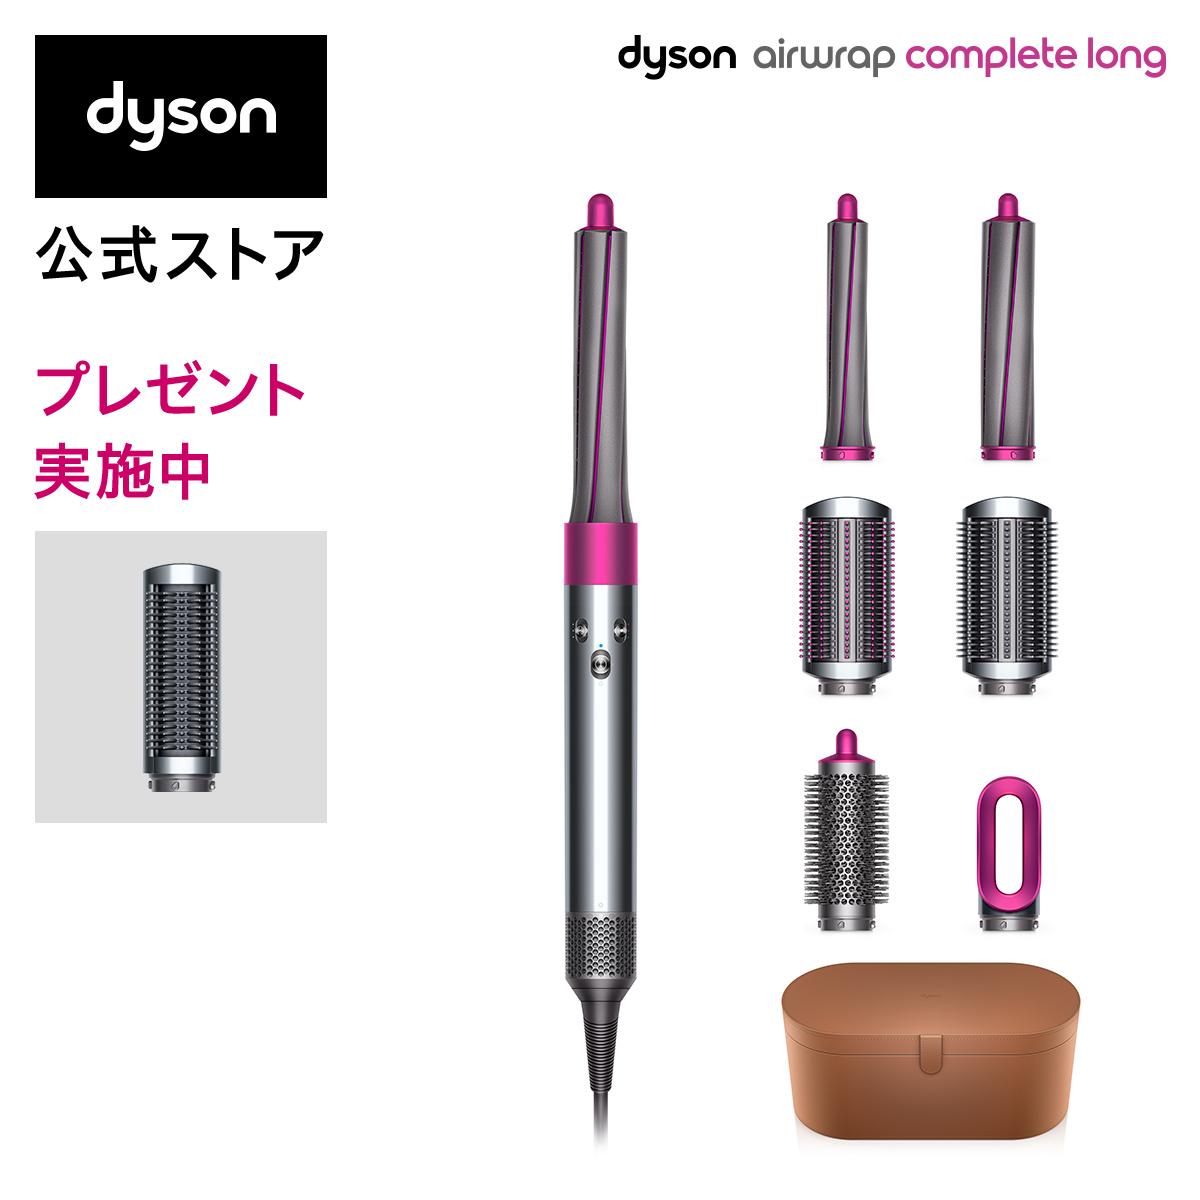 Dyson Airwrap Complete 送料無料激安祭 Long ダイソン エアラップ コンプリート ロング HS01 COMP フューシャ 特別プレゼント付き:別送 ニッケル 往復送料無料 6 LG 30新発売 NF